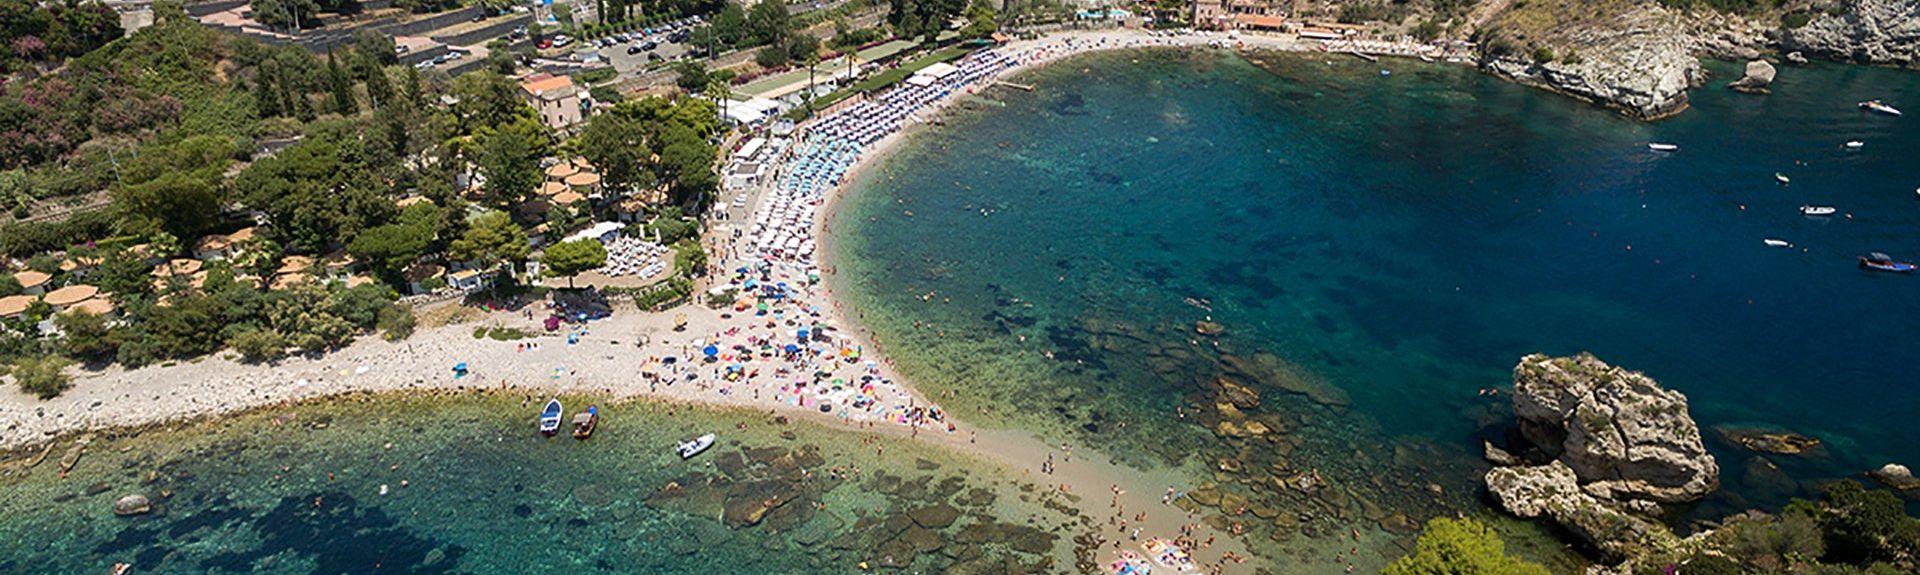 Letojanni, Messina, Sicily, Italy